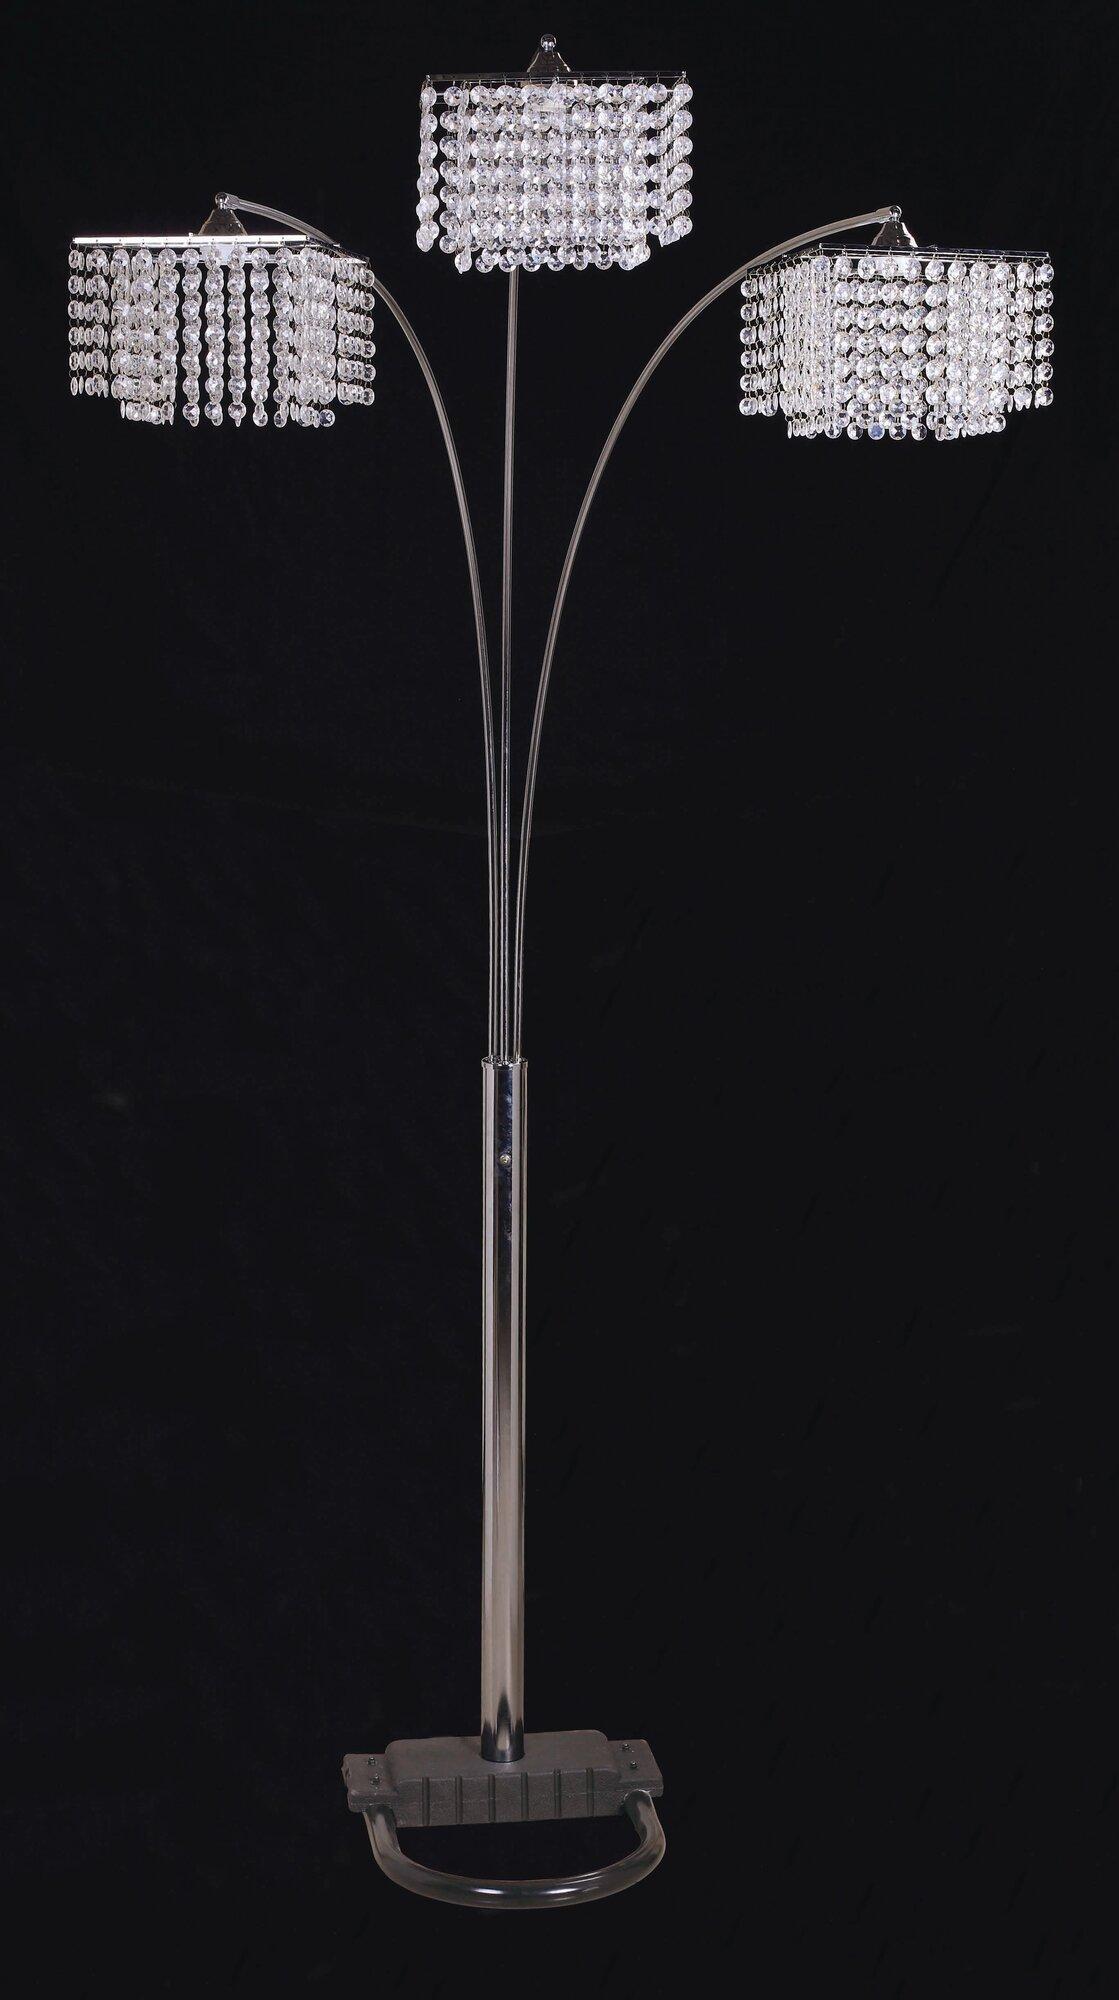 ore furniture arch floor lamp ebay. Black Bedroom Furniture Sets. Home Design Ideas